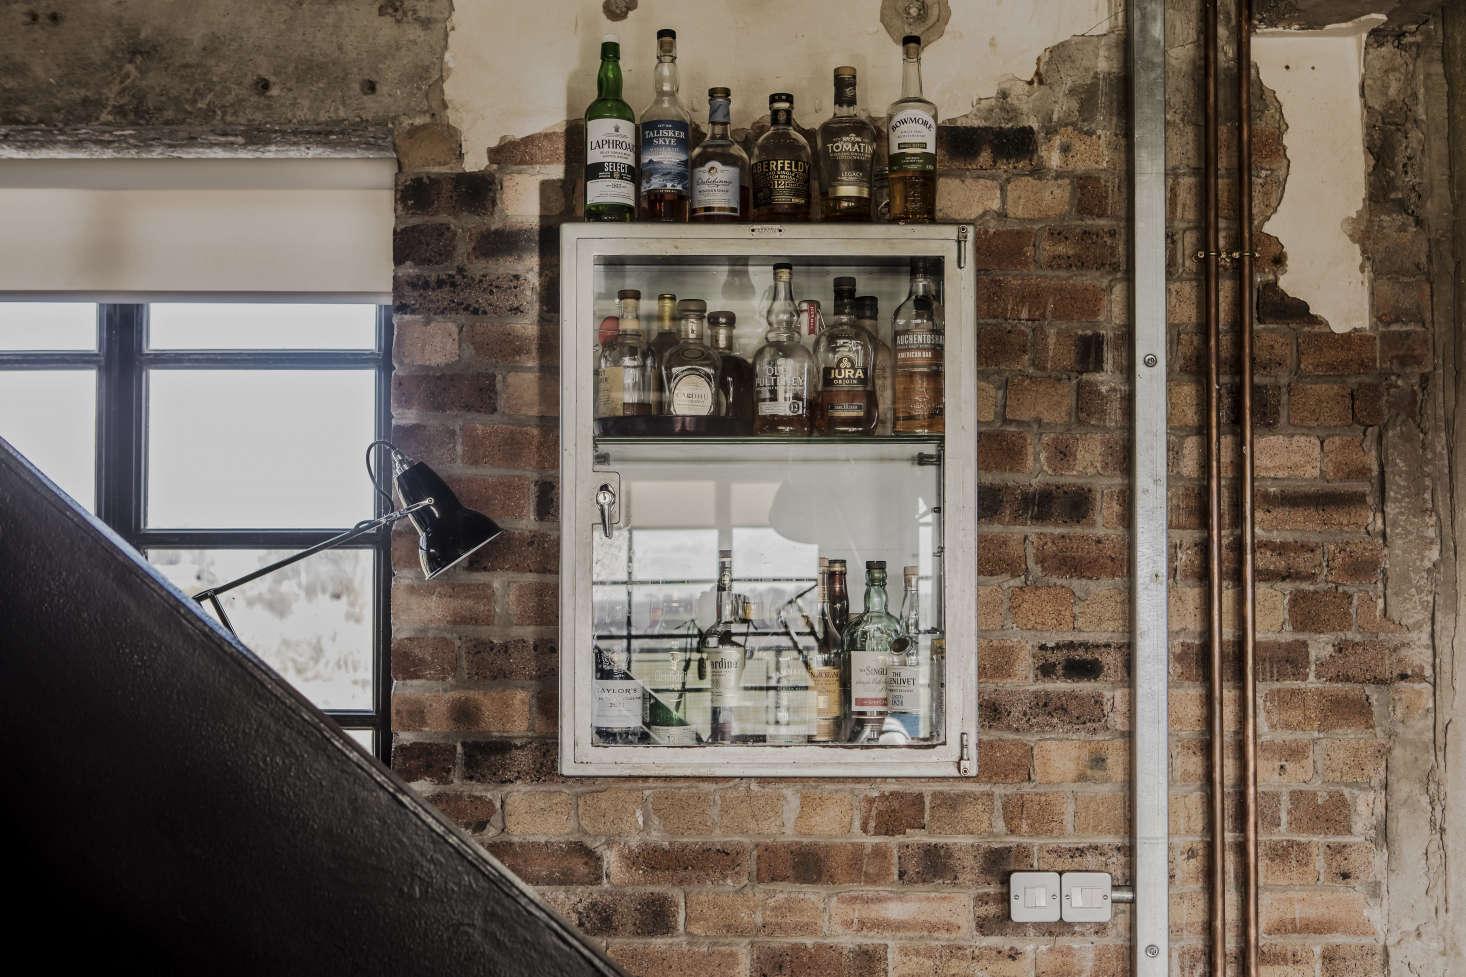 A vintage medicine cabinet serves as a liquor cupboard.